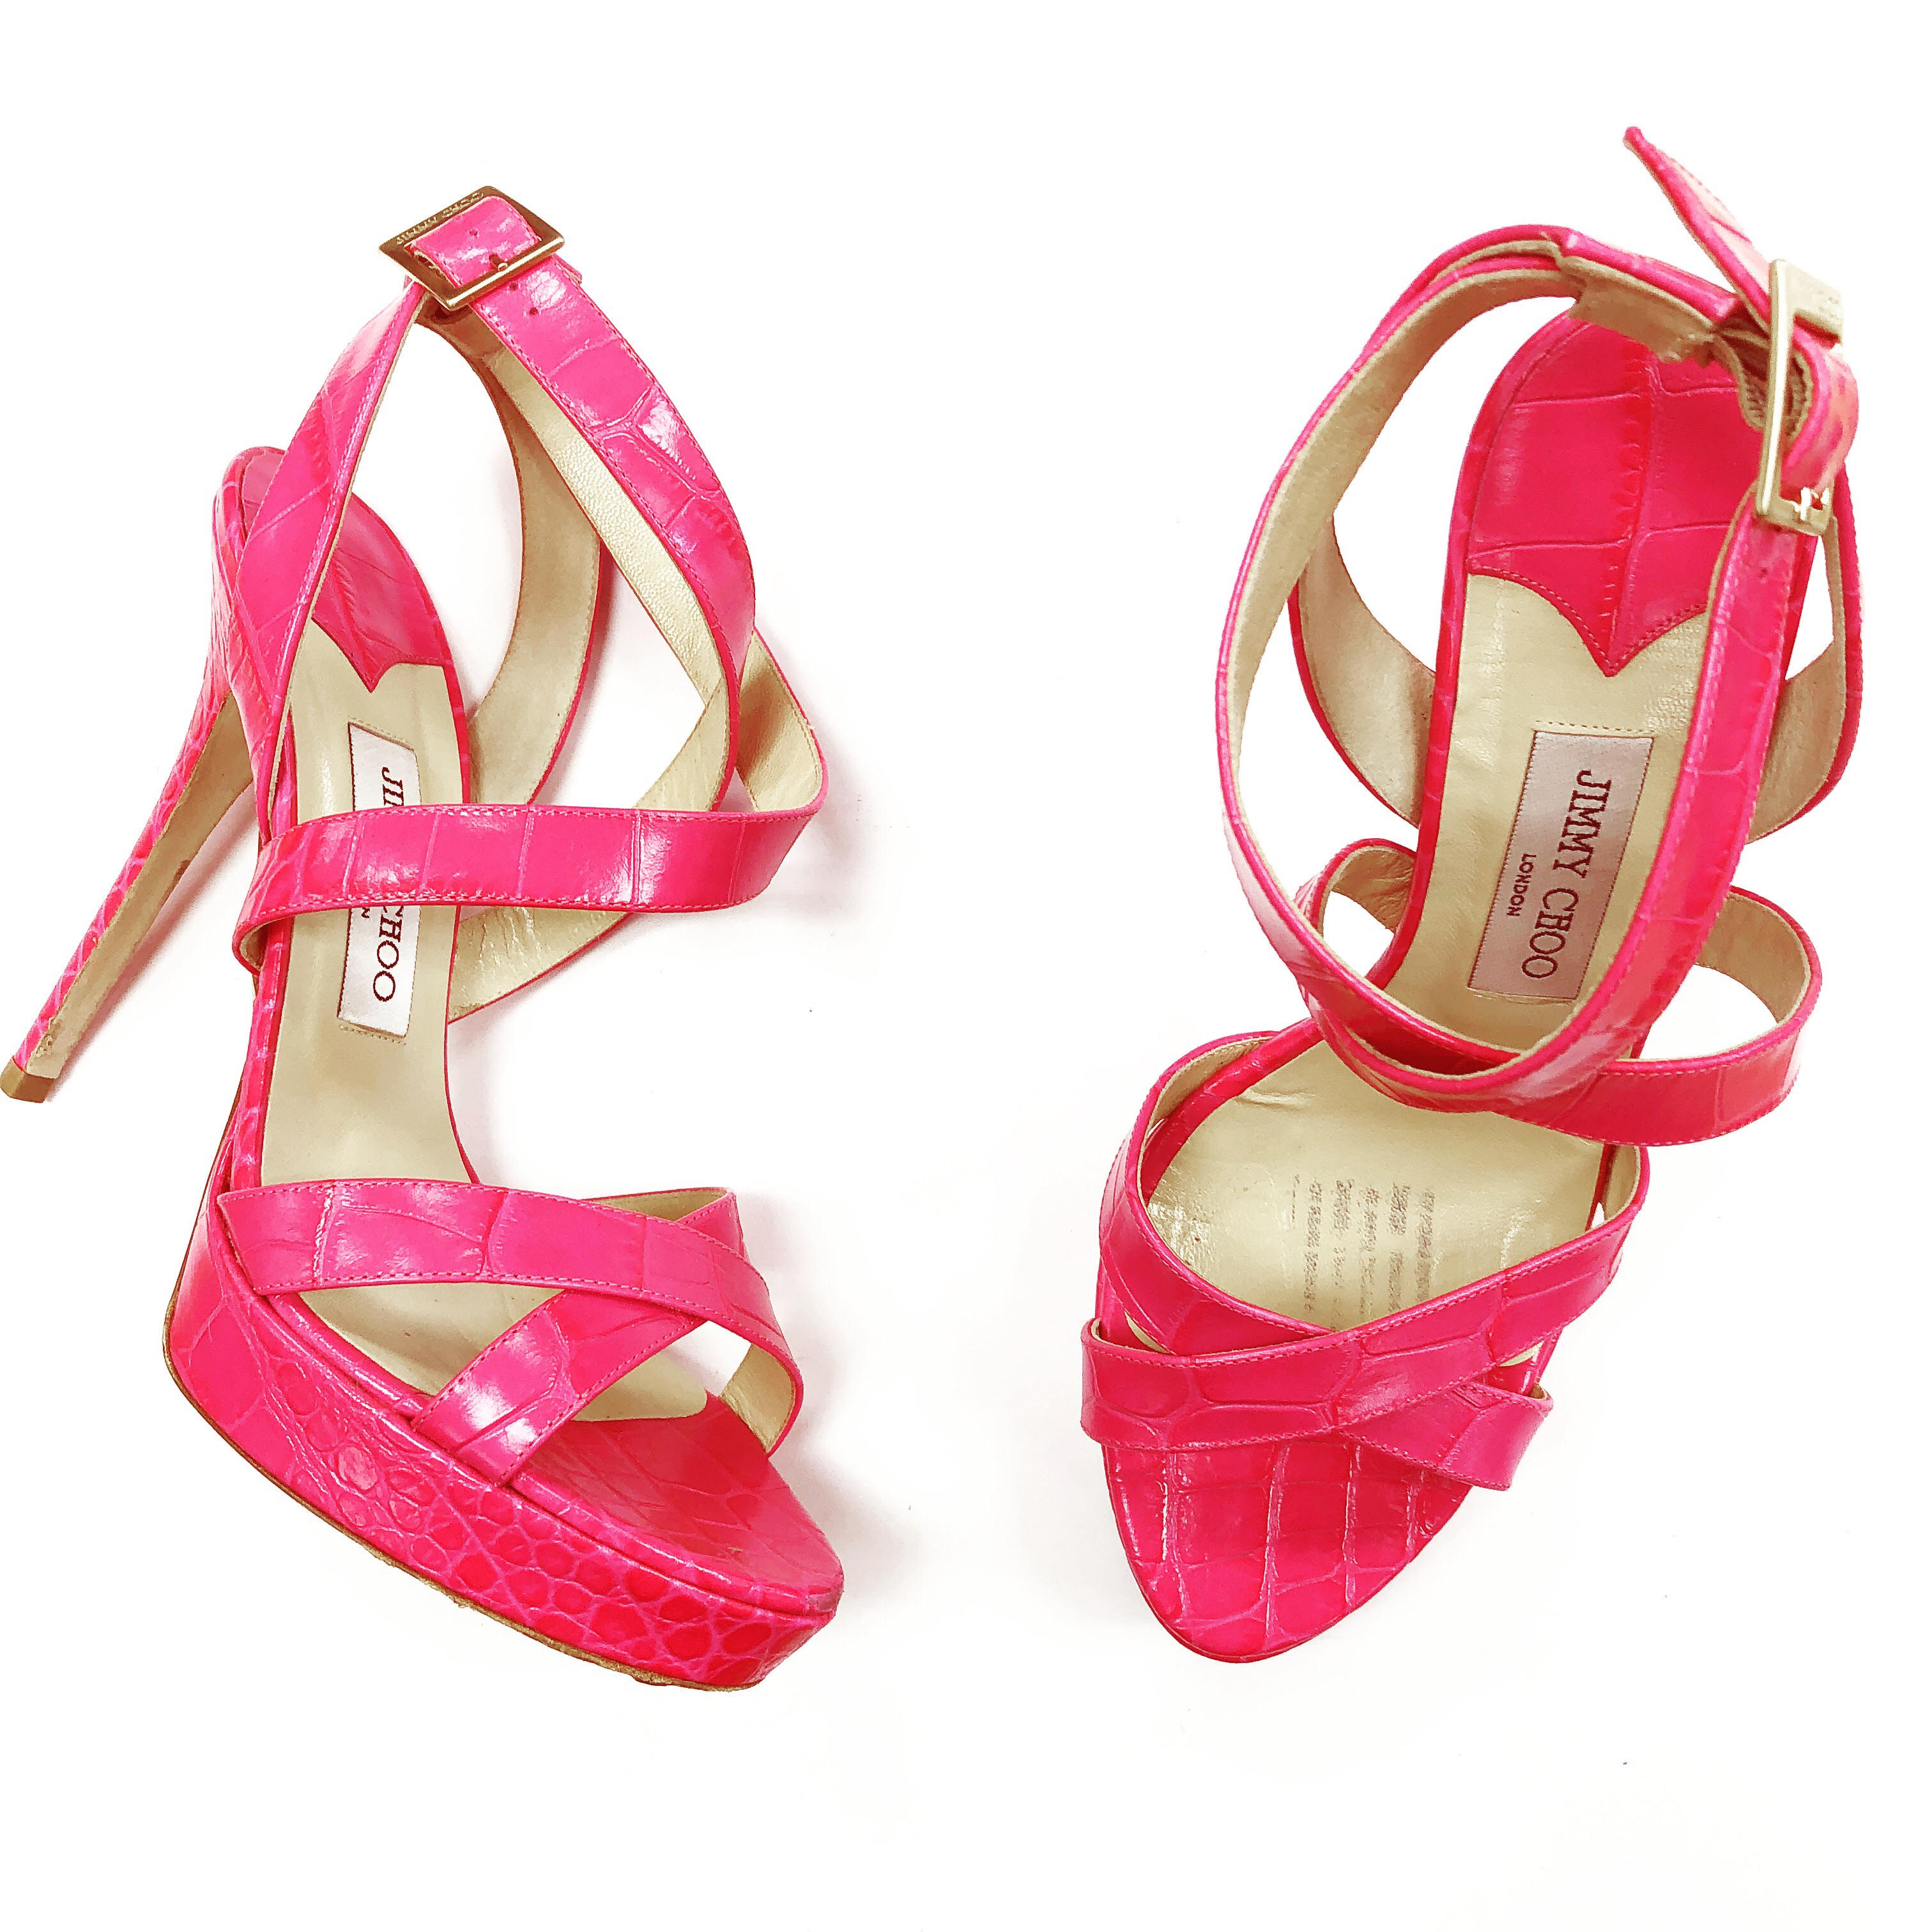 Shoes_162699A.jpg